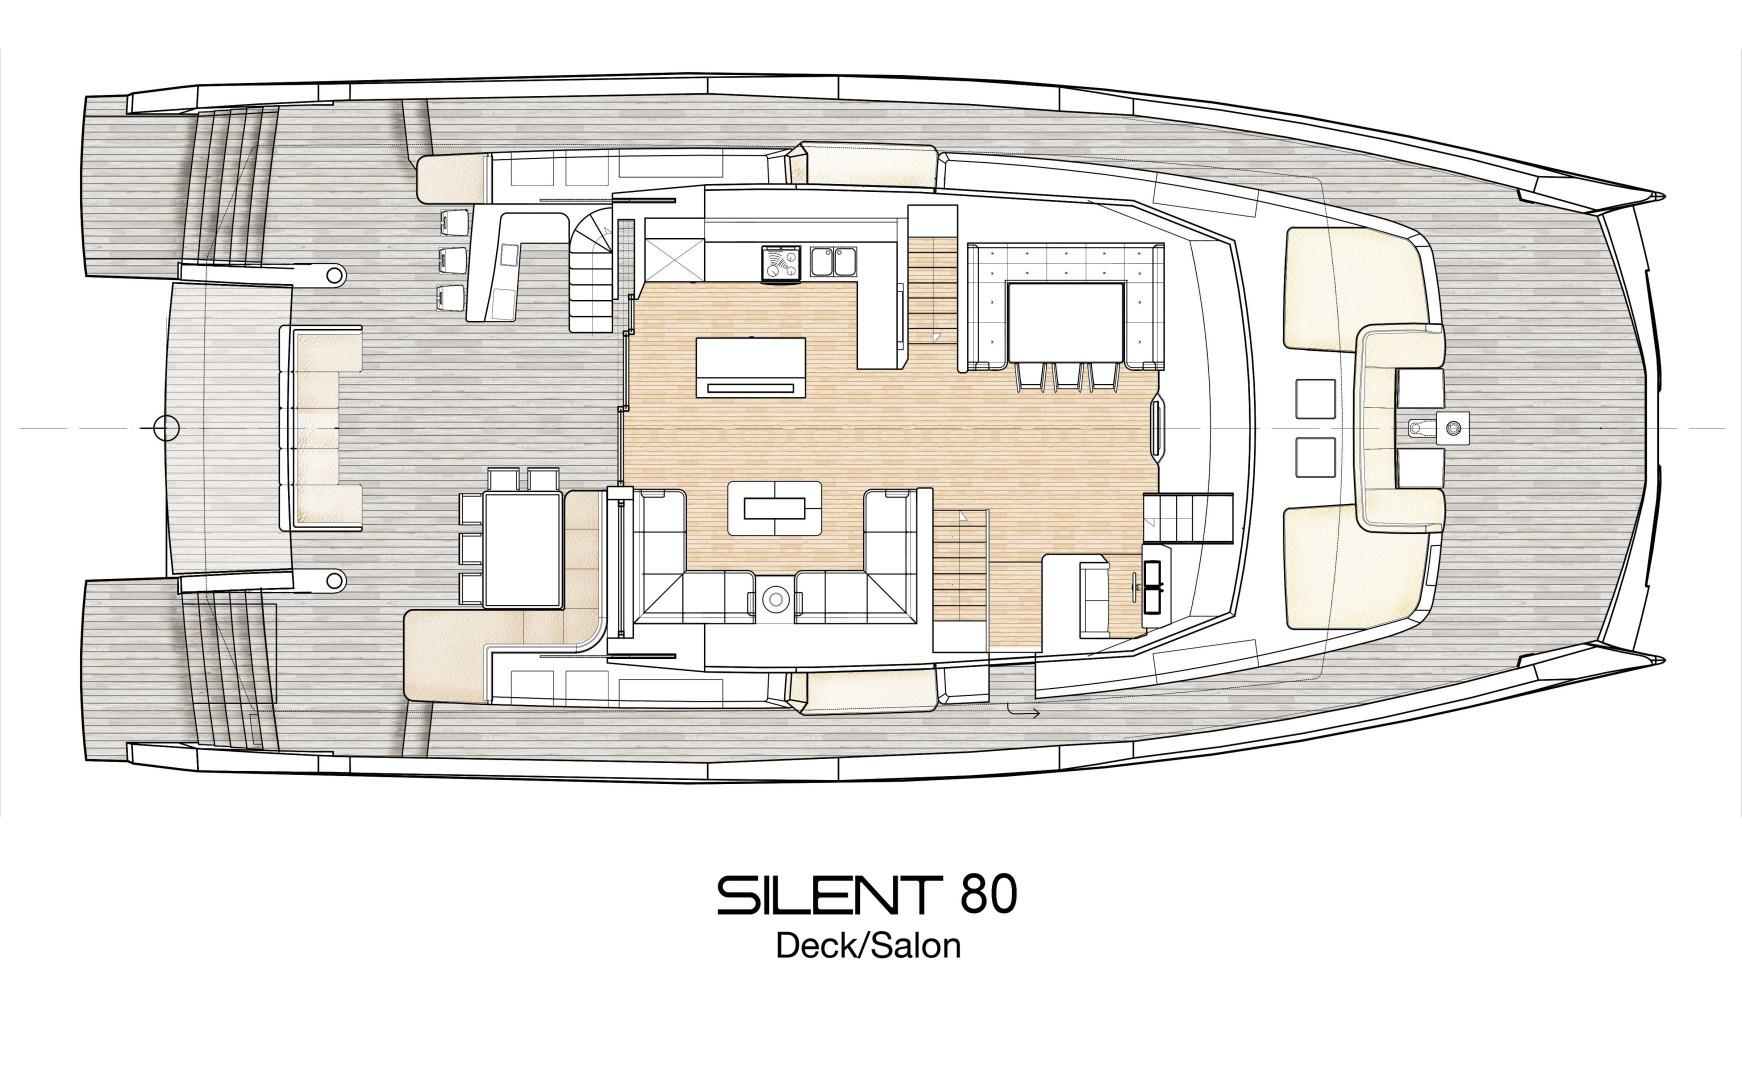 Silent-Yachts-Silent 80  2020-SILENT 80 Ancona-Italy-1262647 | Thumbnail